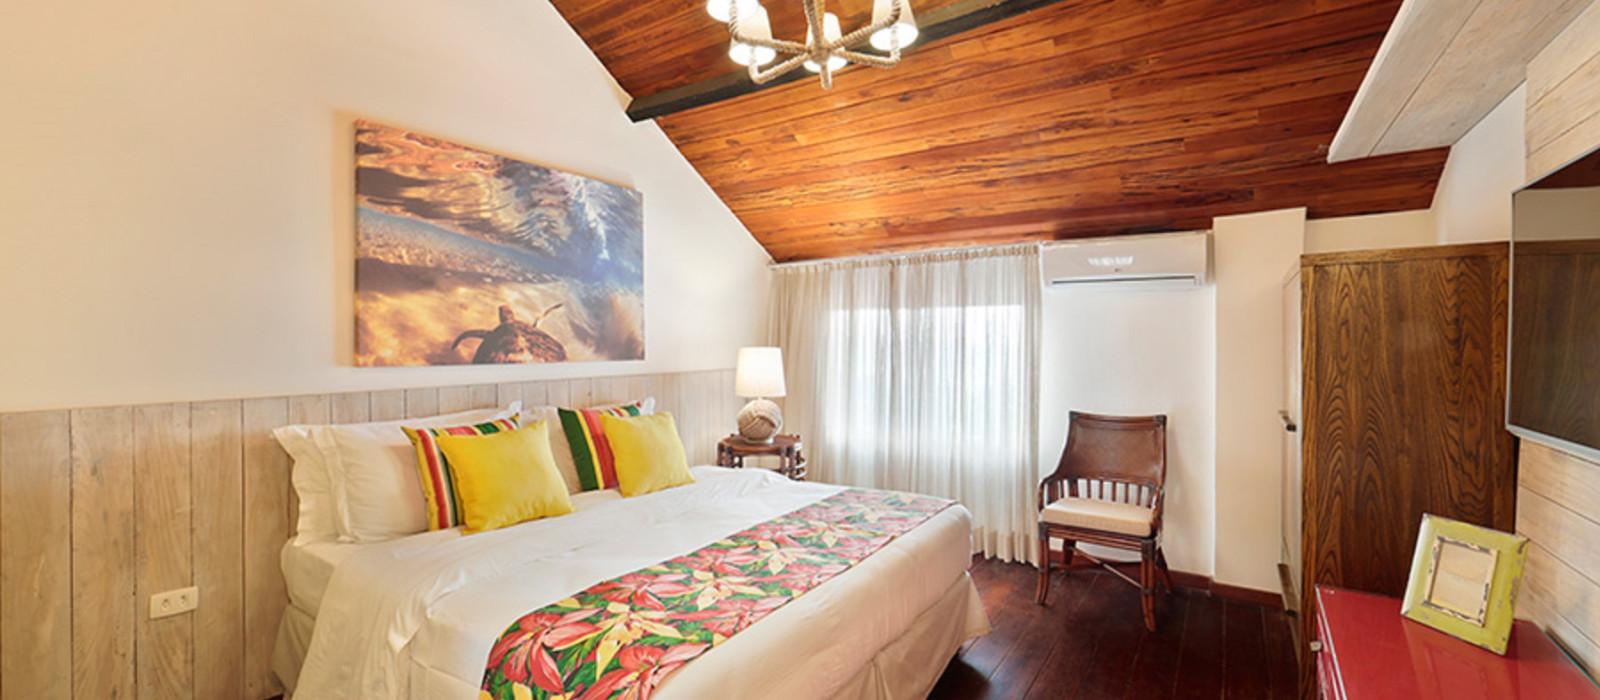 Hotel Pousada da Praia Brasilien